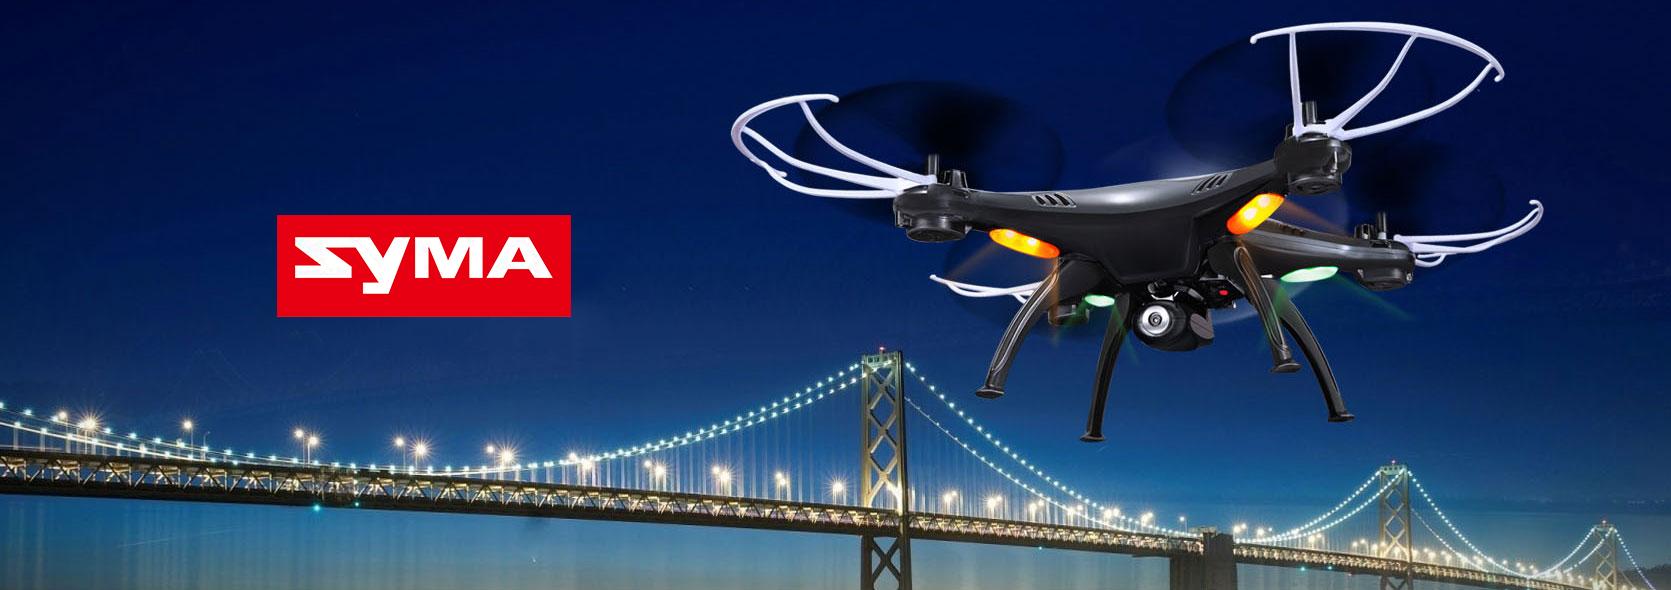 syma-drone-quadcoper-best-sri-lanka